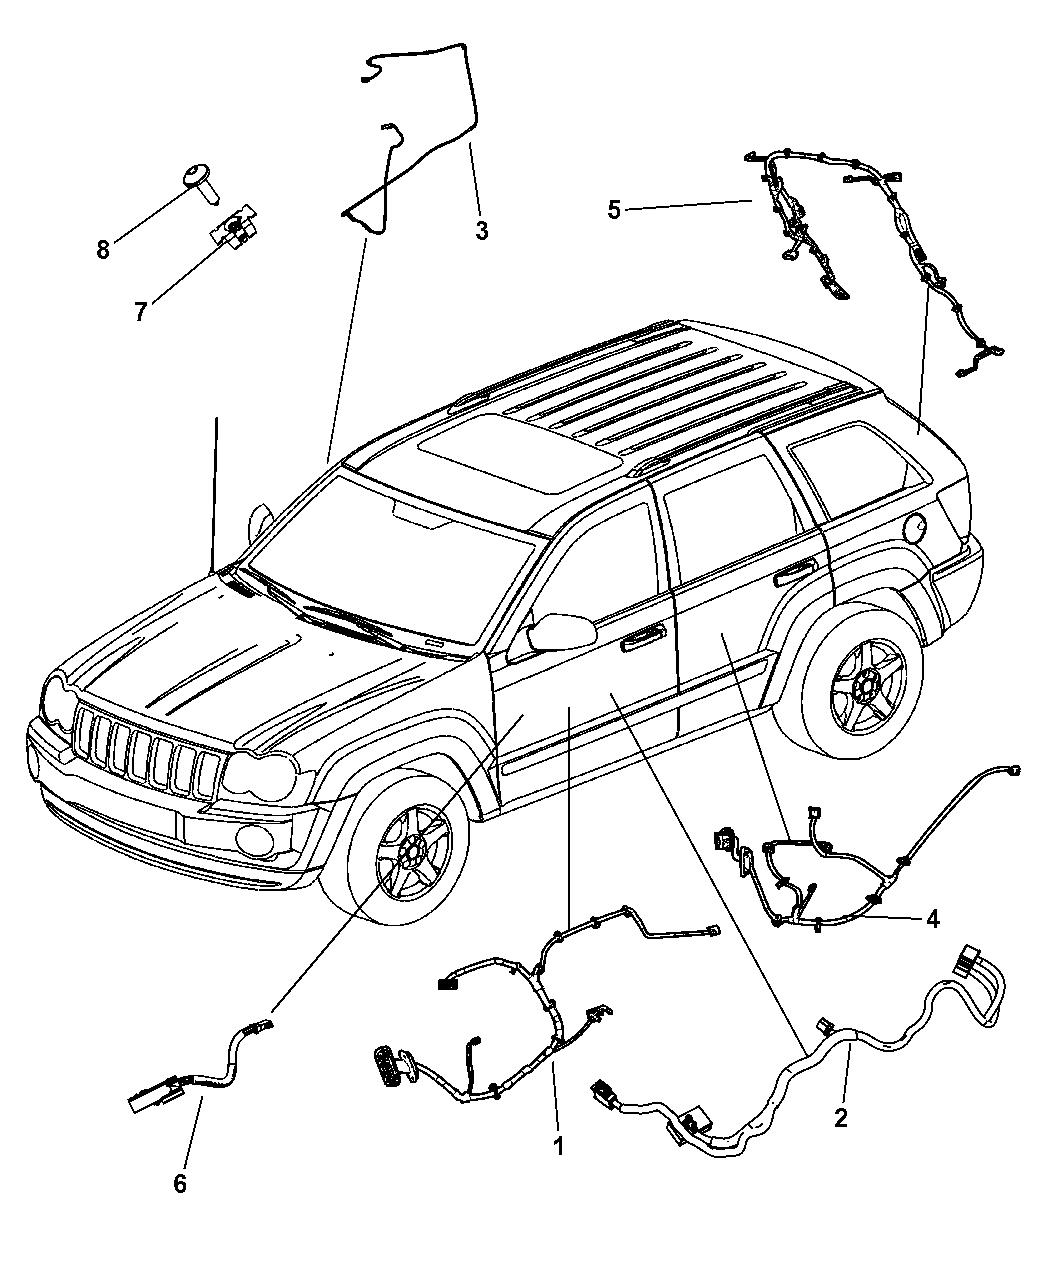 68087563aa